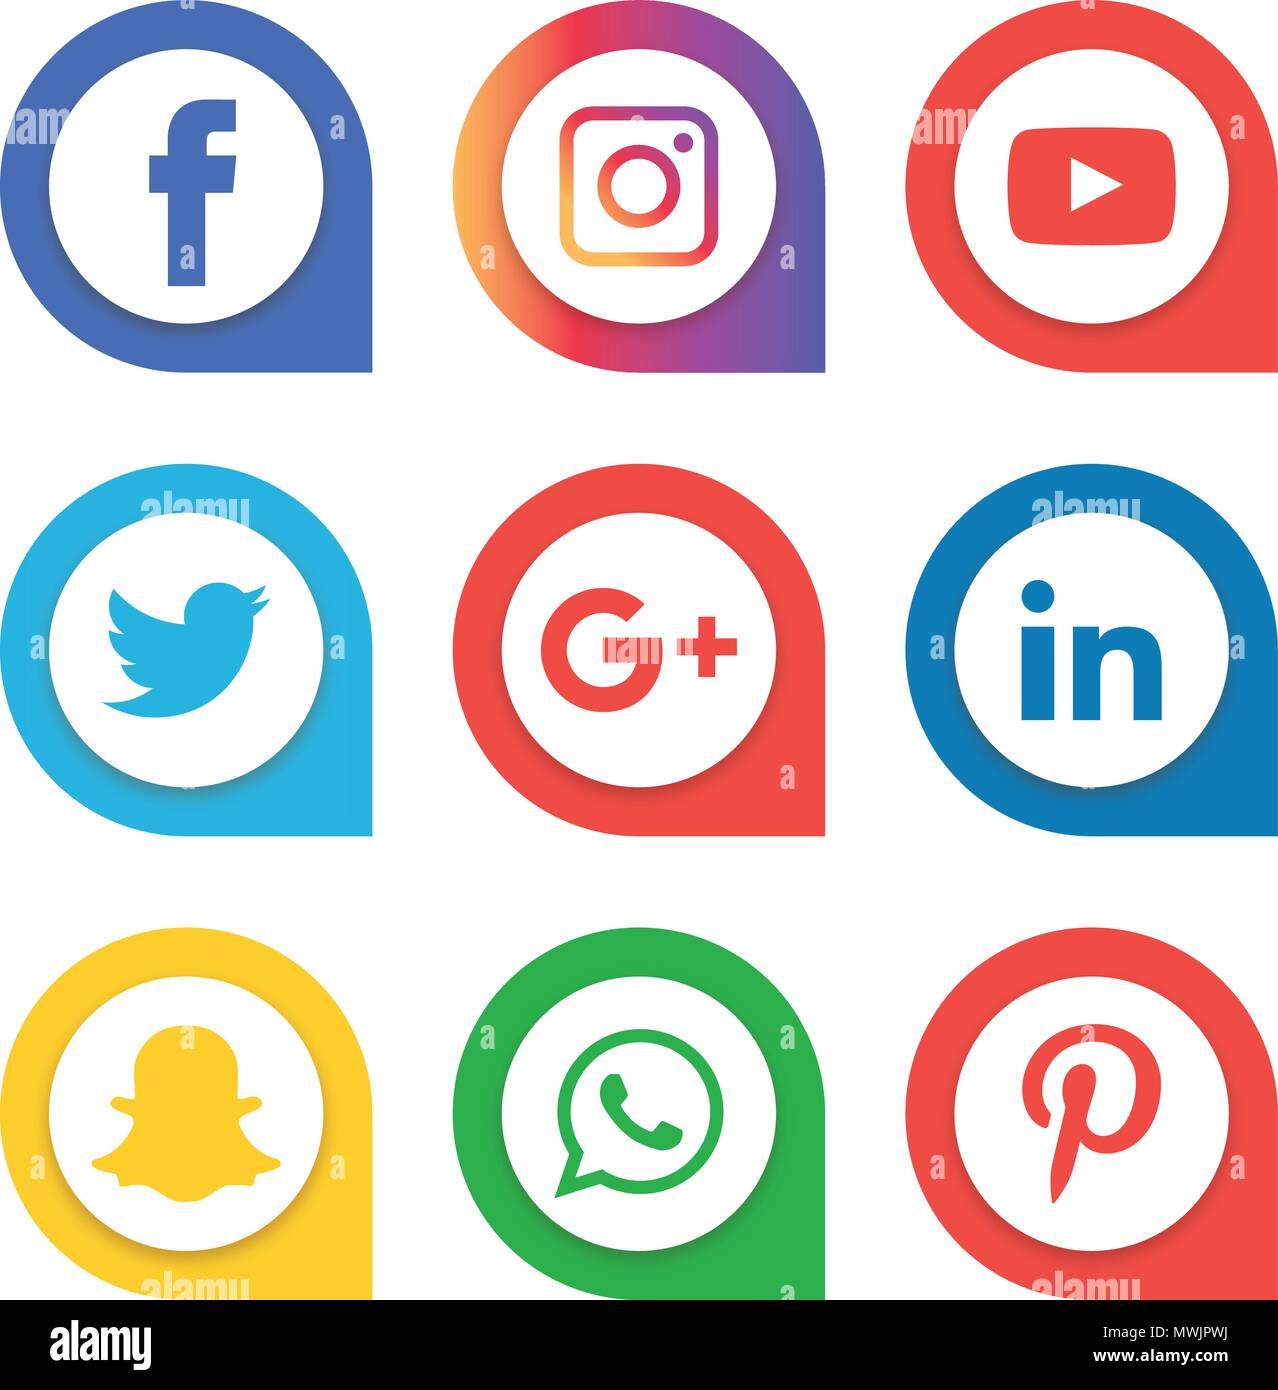 Whatsapp Logo Stock Photos & Whatsapp Logo Stock Images - Alamy